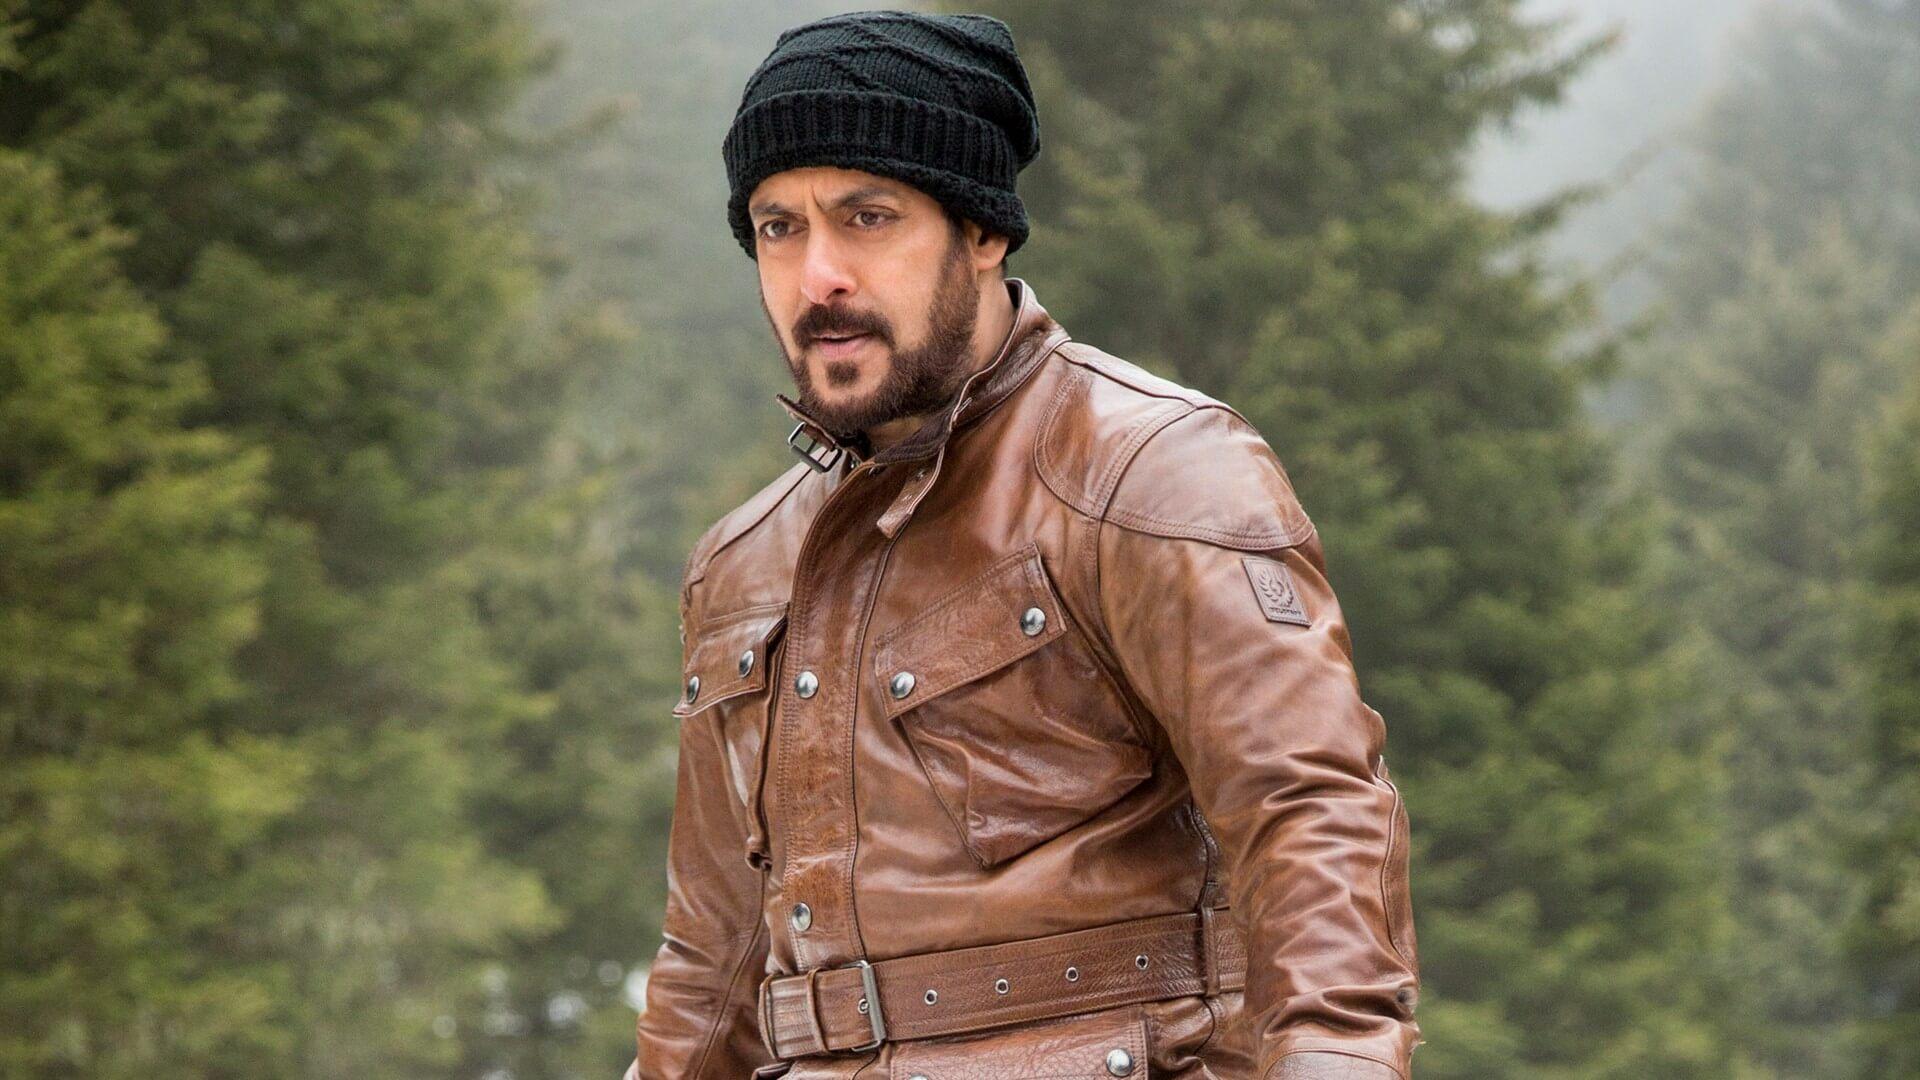 Salman Khan Photo, Age, News, Birthday, Height, Sister, Biography, Girlfriend, Awards, Address, Song, Video, Net Worth, Education, Twitter, Instagram, Facebook, Wiki, Imdb, Website, Youtube (8)